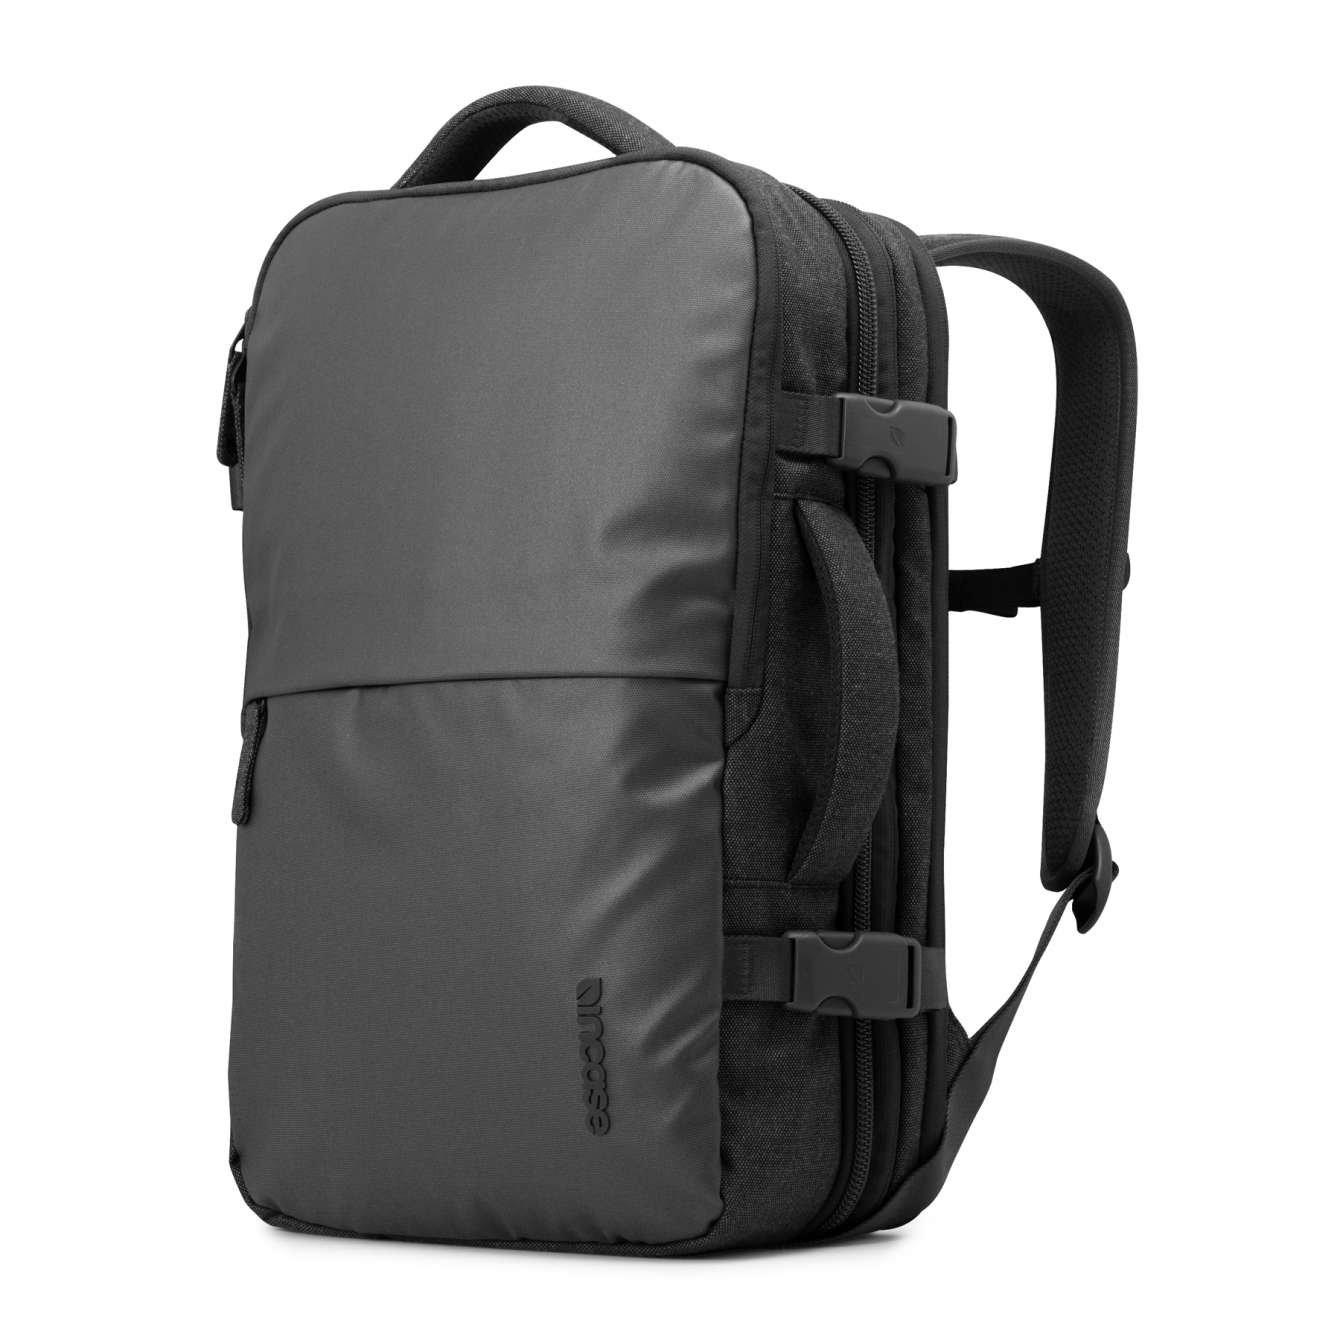 Amazon.com: Incase Men's Travel Backpack,